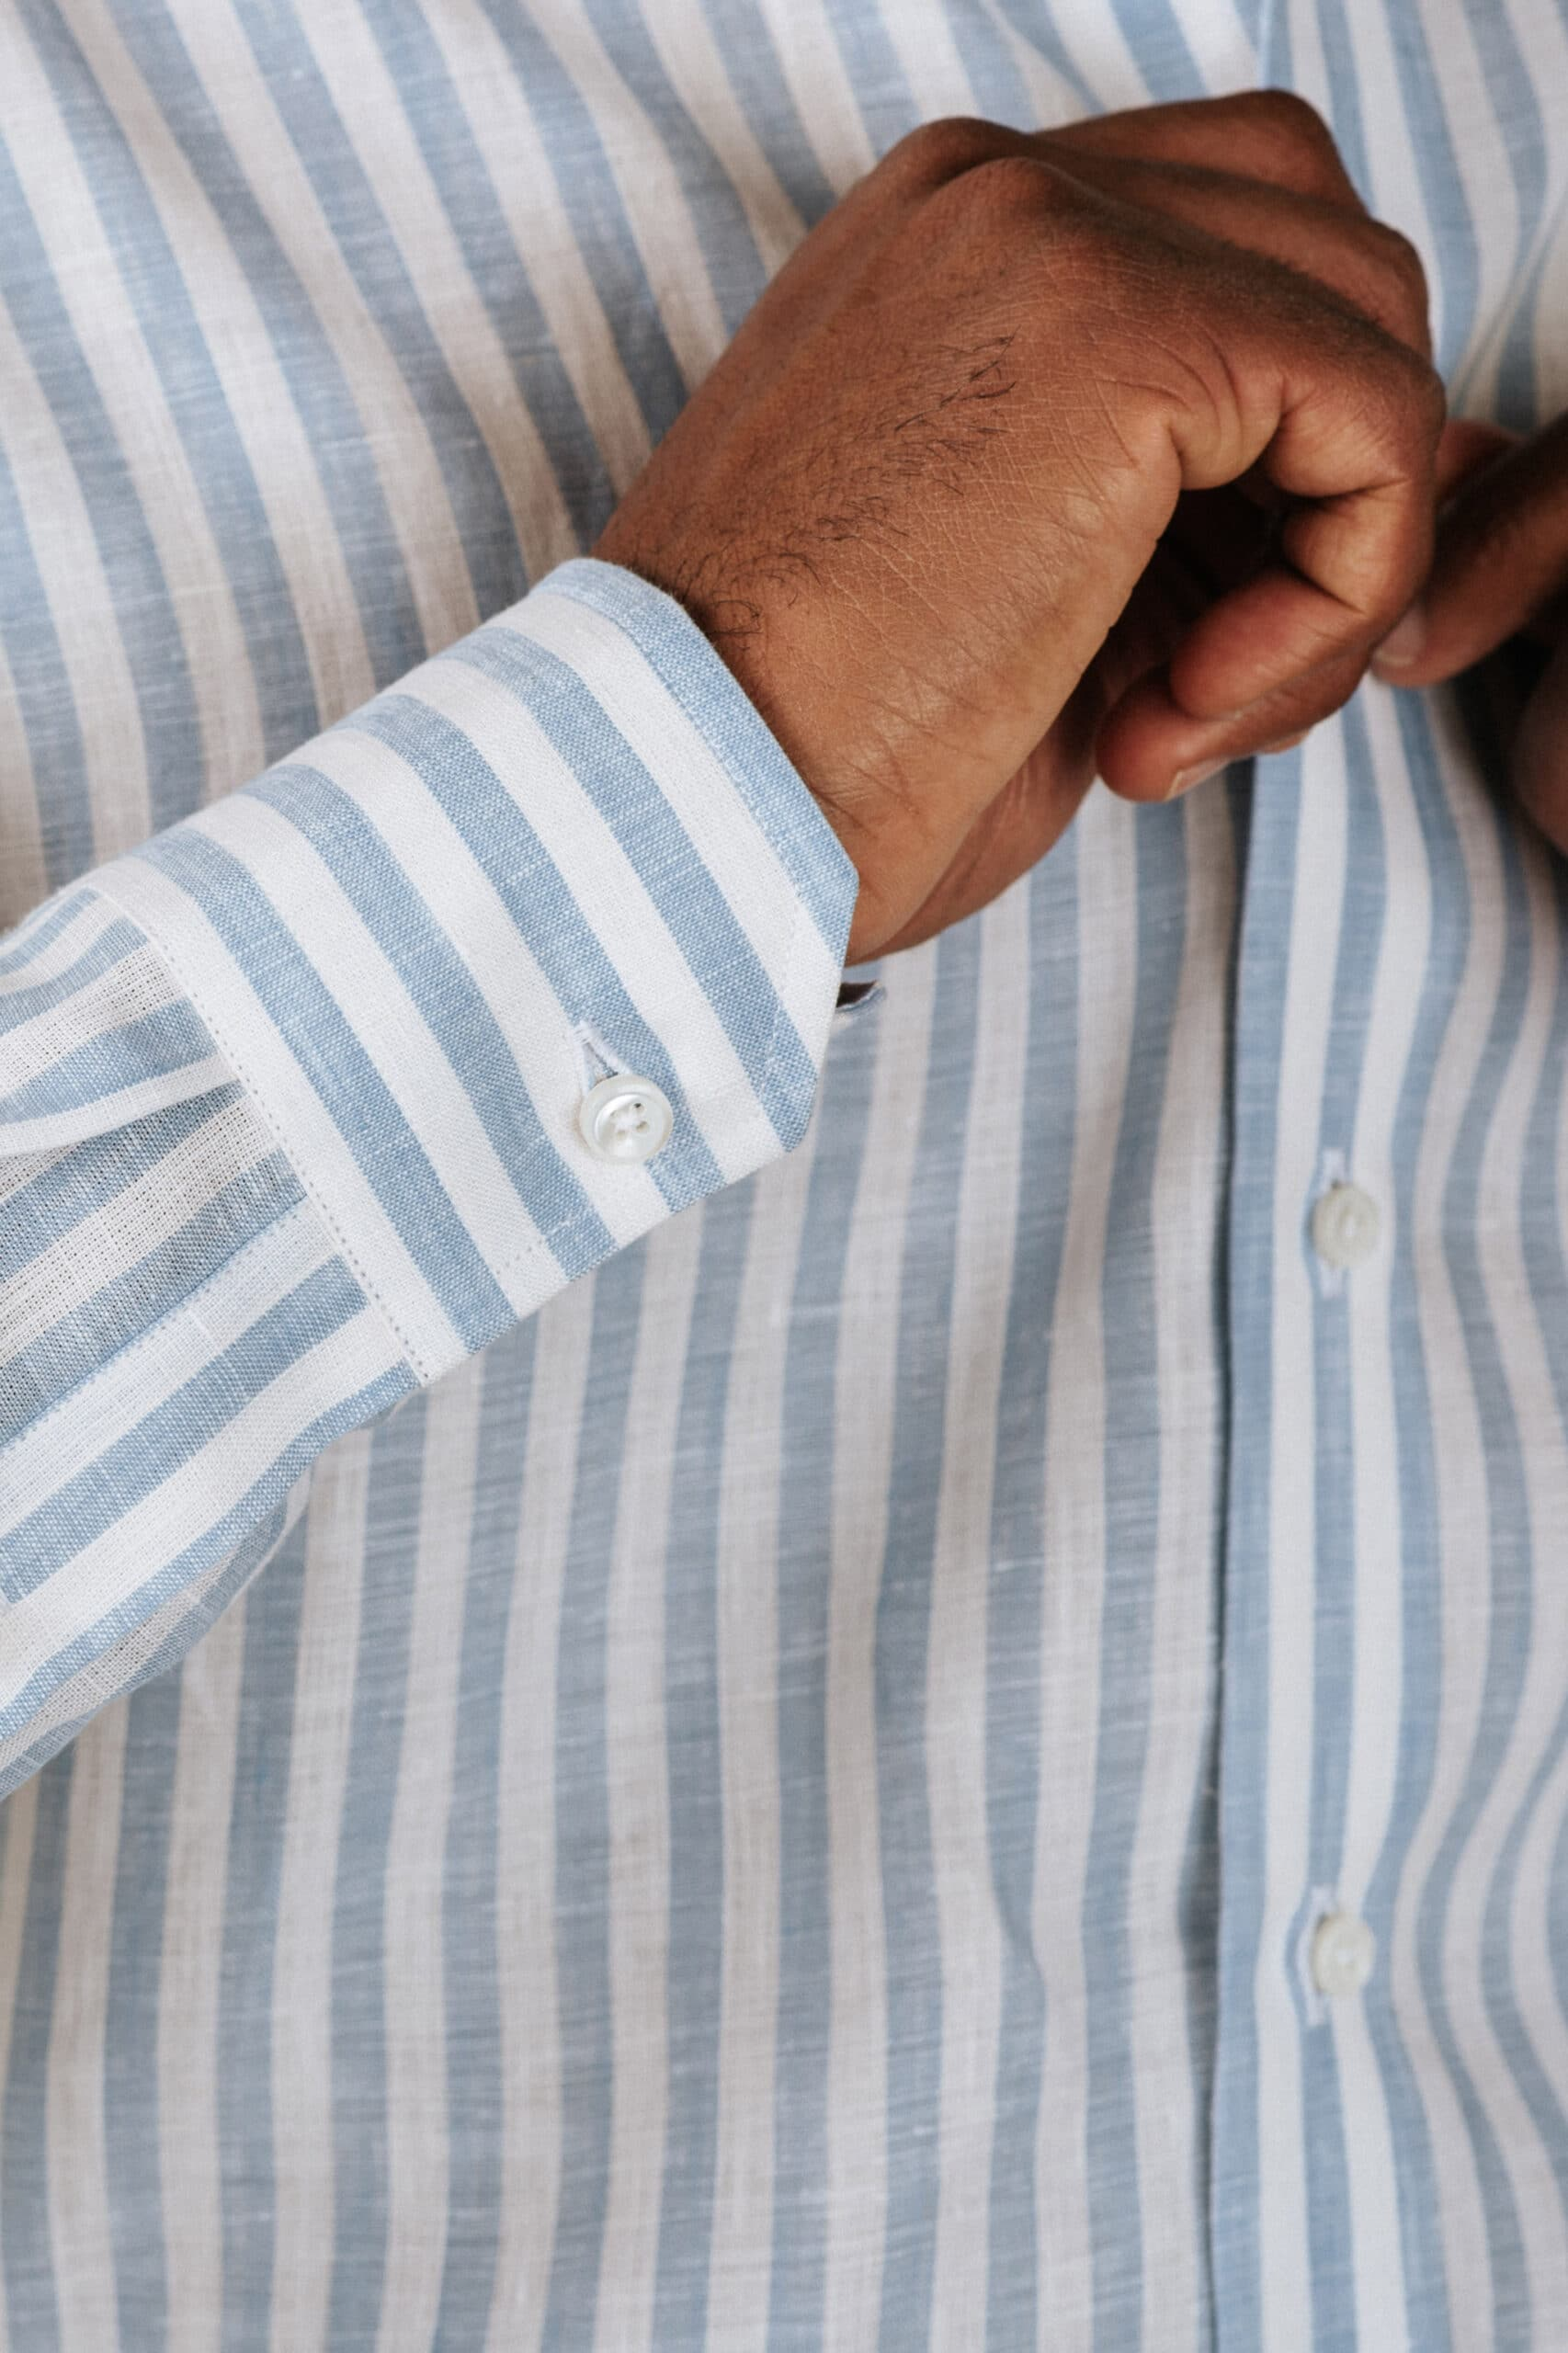 linnen maarshirt blauw wit